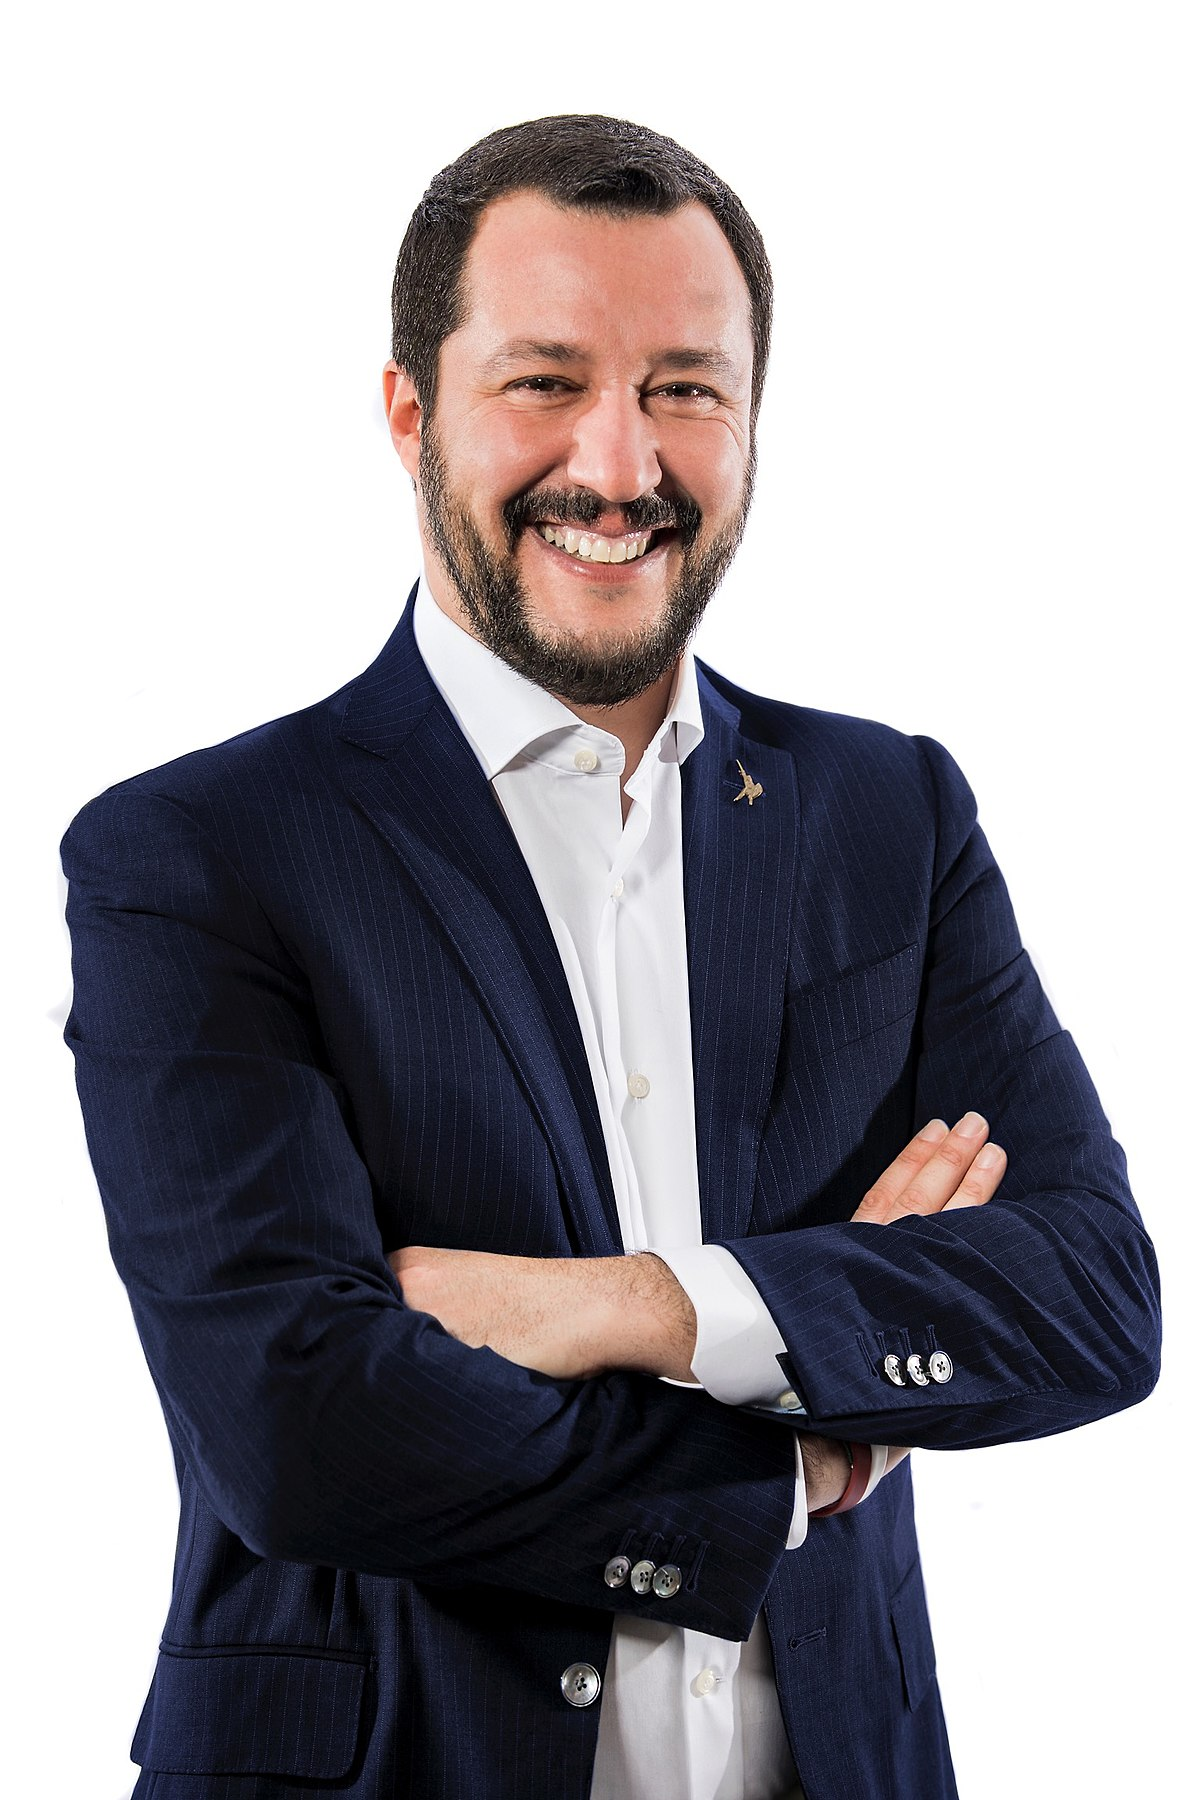 4D Chess Is Not Happening Matteo Salvini Viminale Politics nationalism European migrants Donald Trump  us canada society culture politics government politics news europe